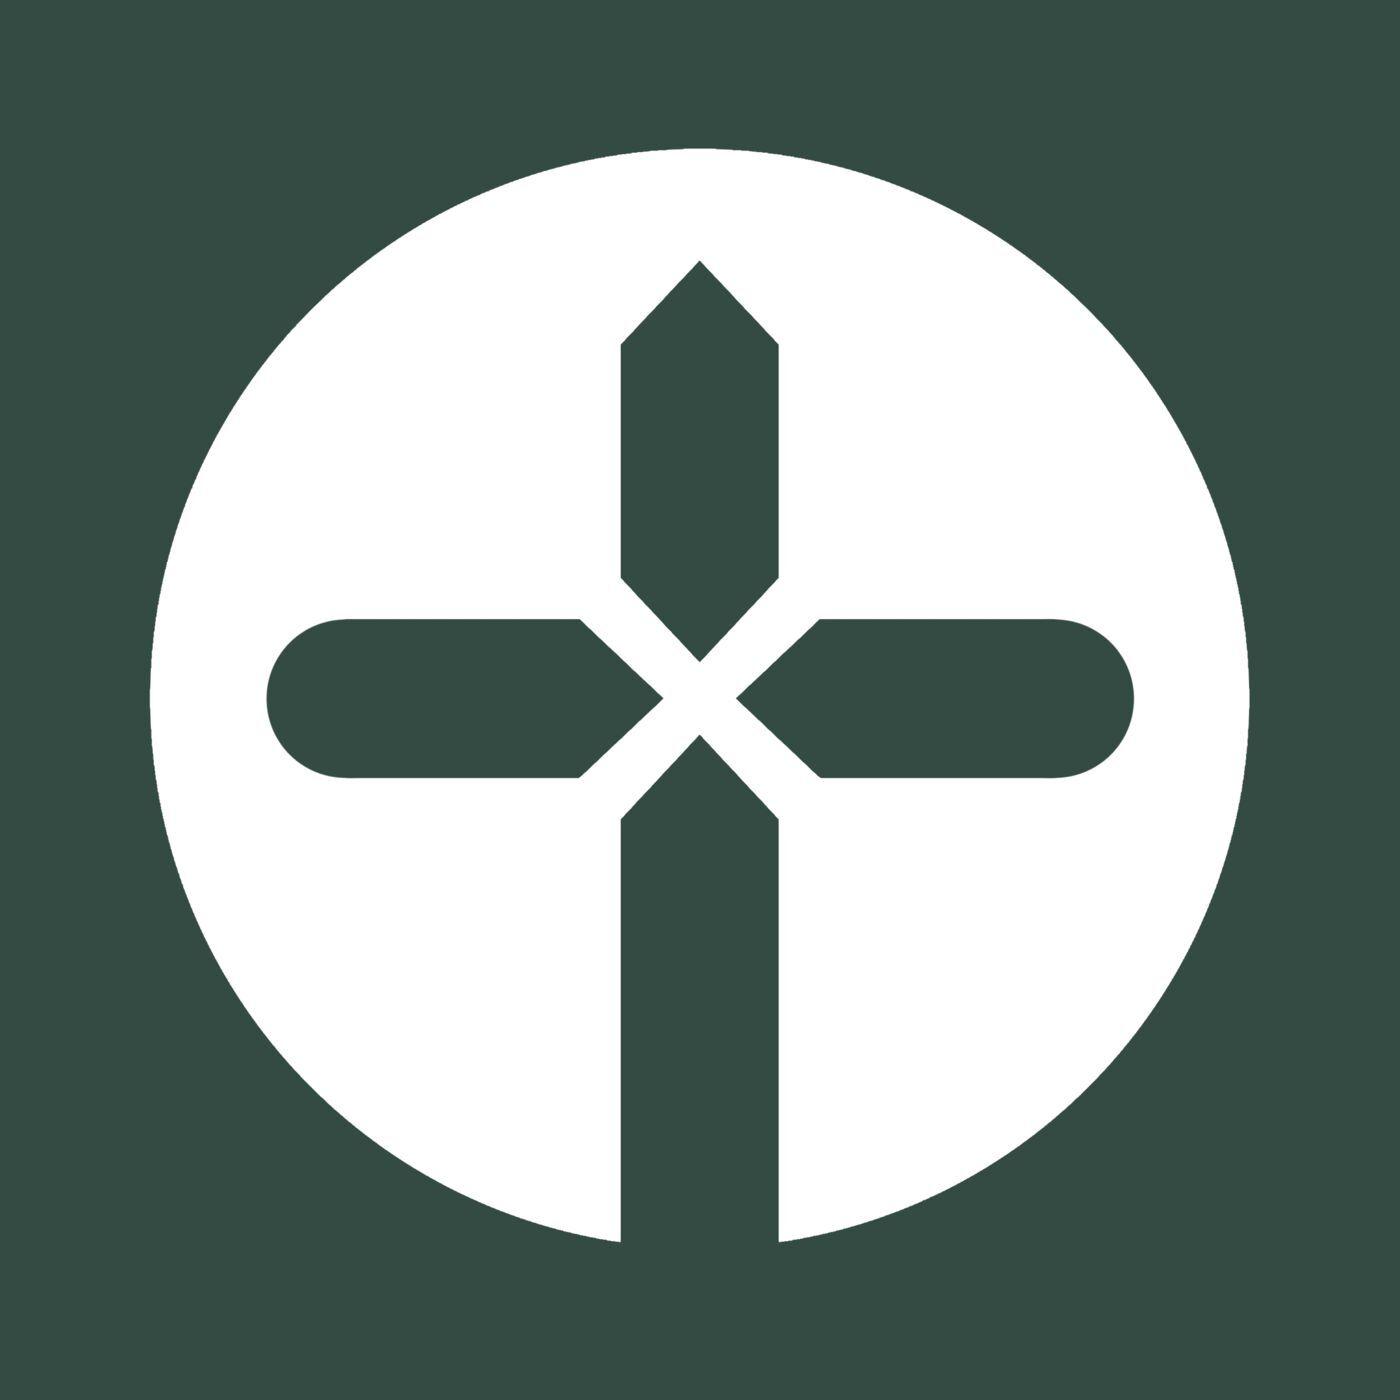 Crosspoint church sermons upside down 2 a new kind of leadership biocorpaavc Choice Image